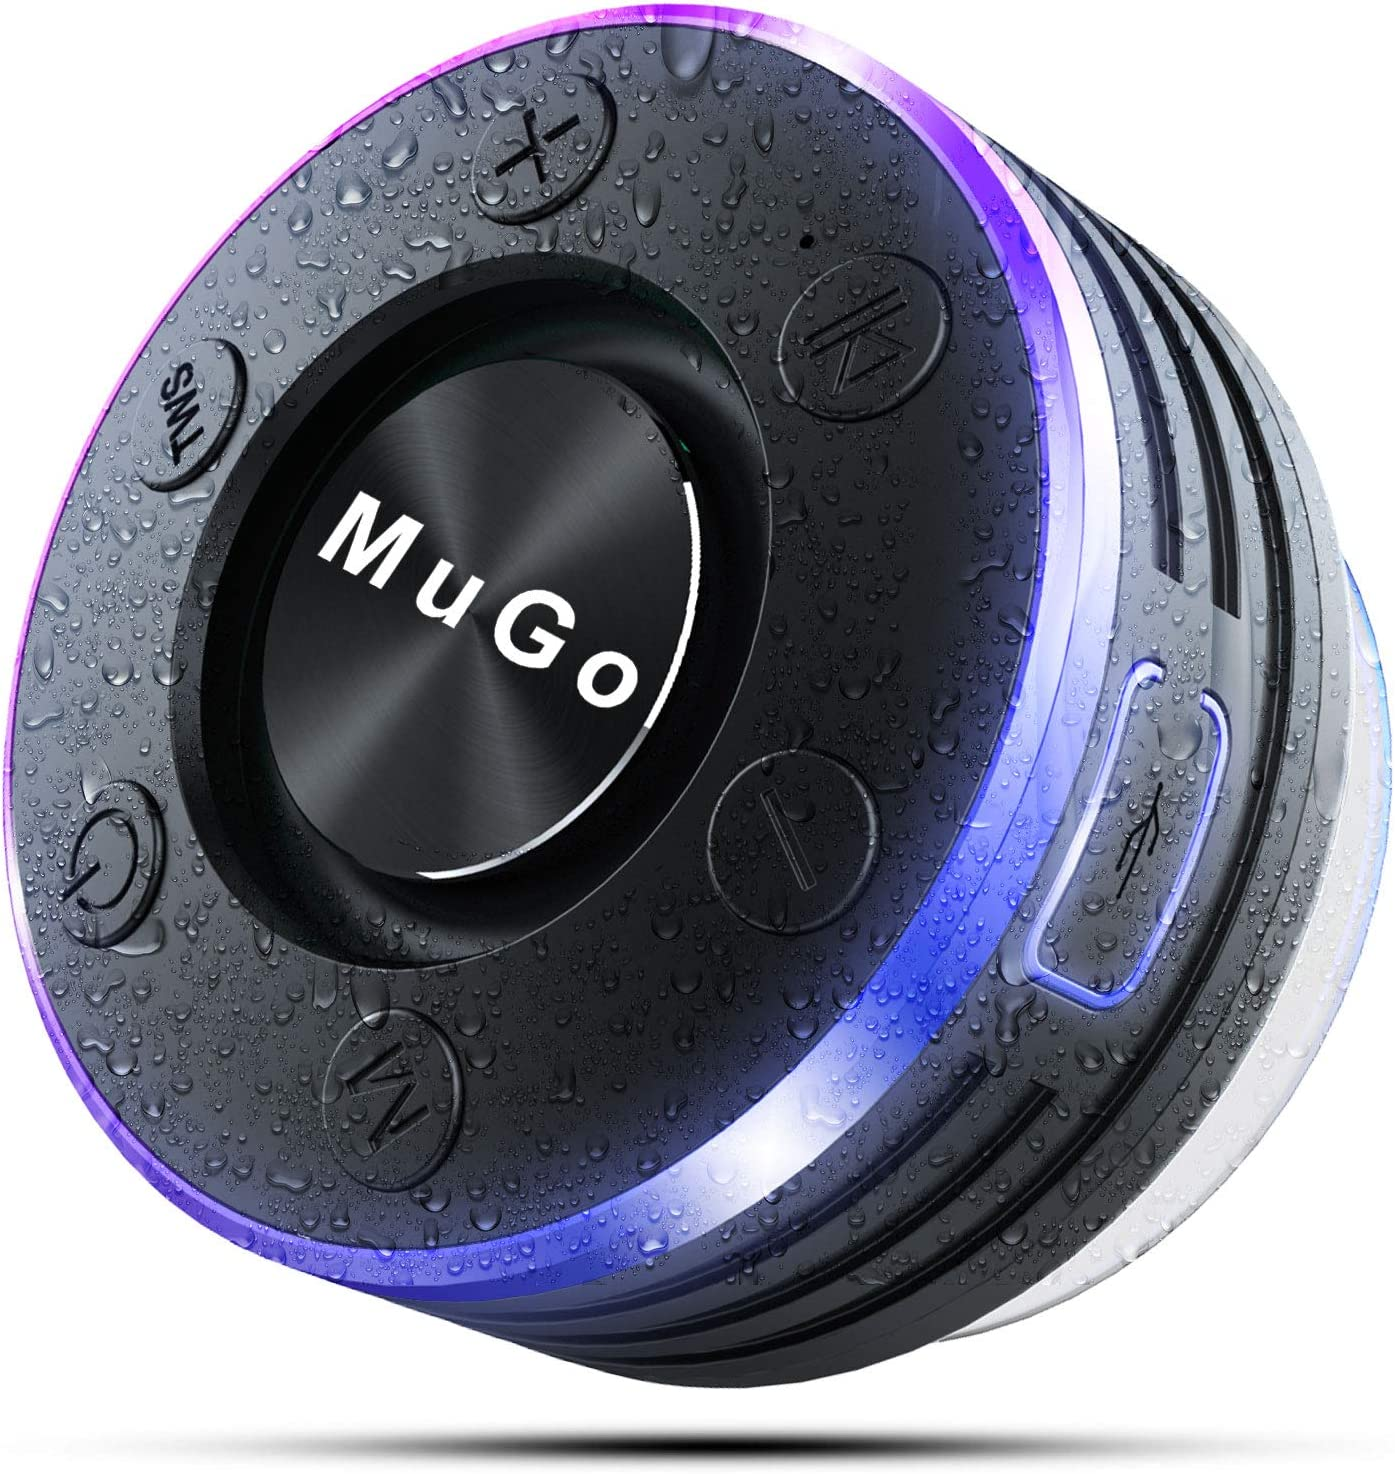 MuGo Bluetooth Speaker Wireless Speaker with Suction Cup